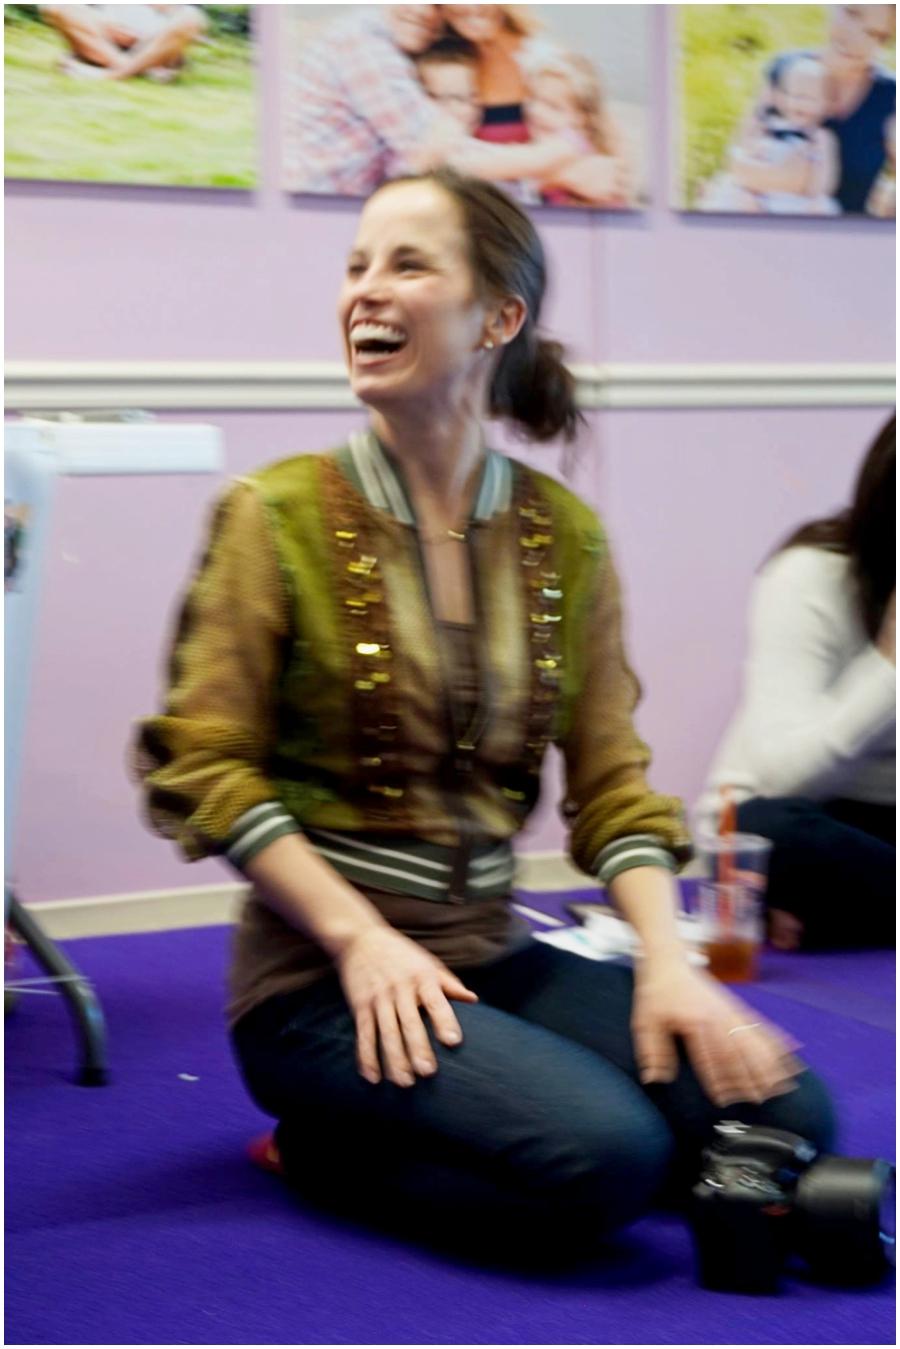 Bethany teaching photography 101 class at Bellani Maternity